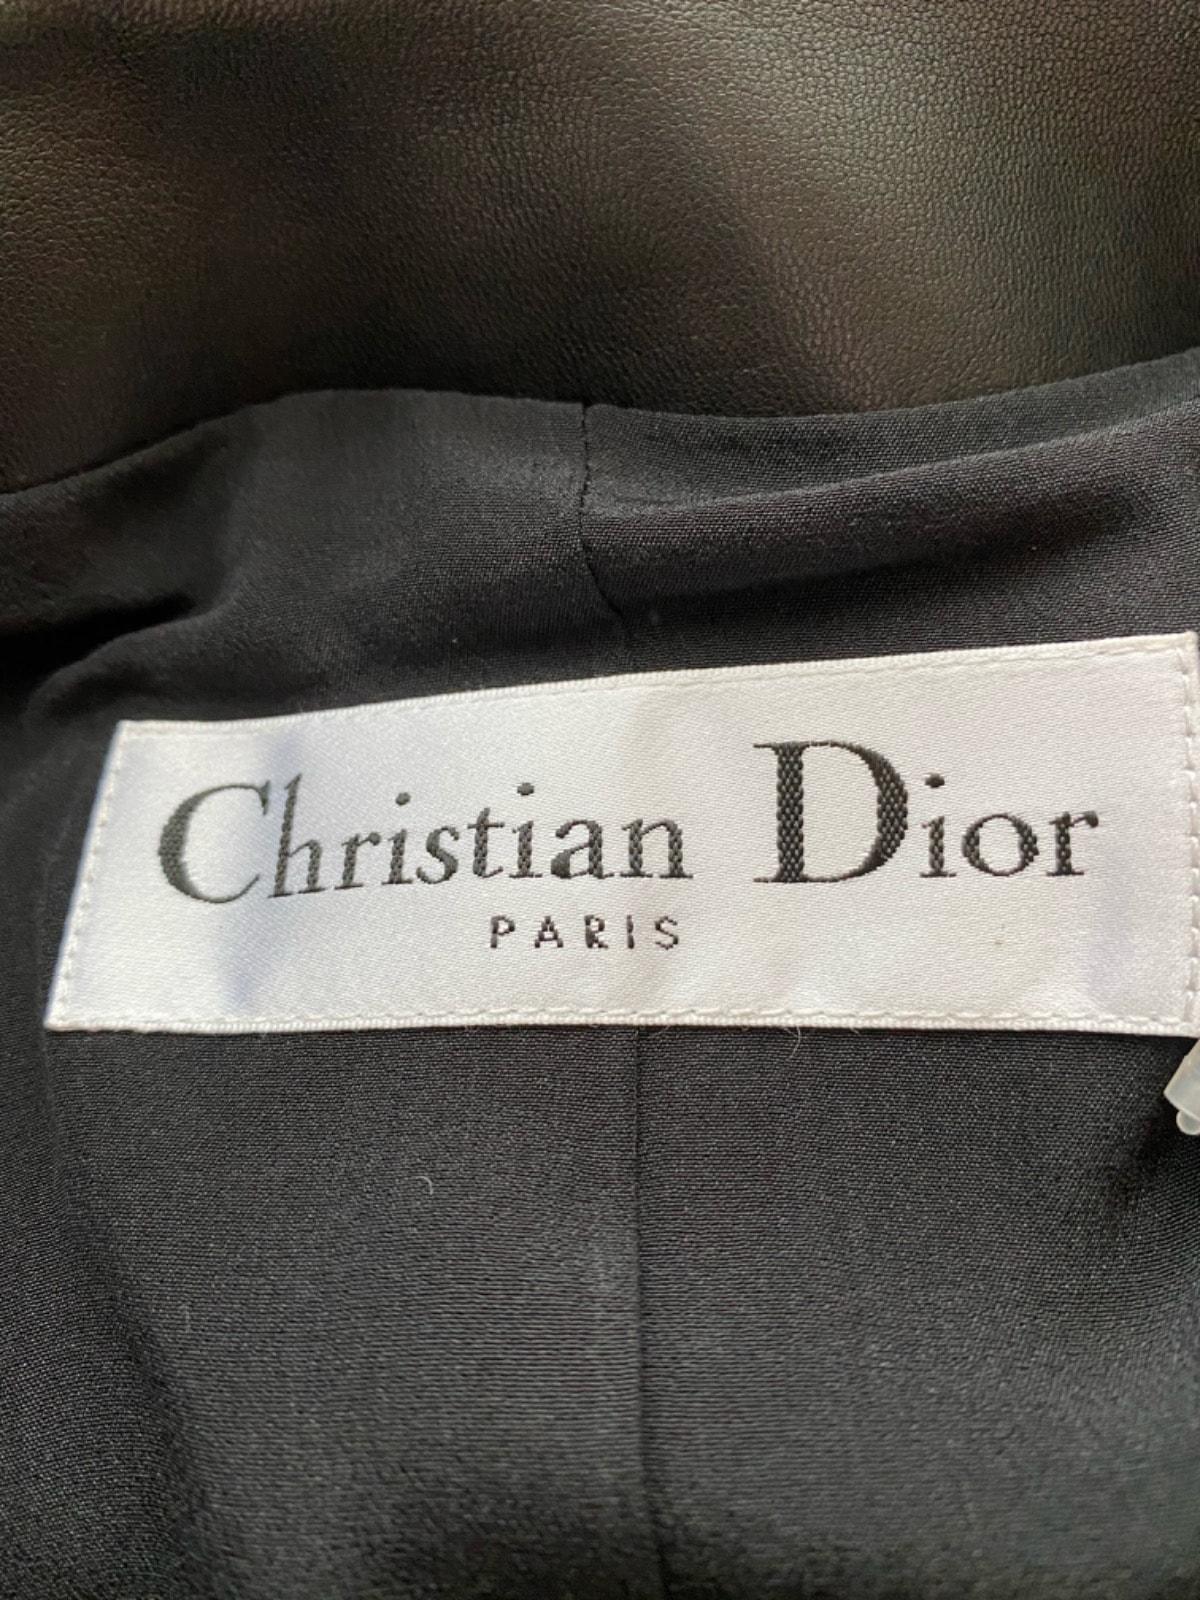 DIOR/ChristianDior(ディオール/クリスチャンディオール)のブルゾン